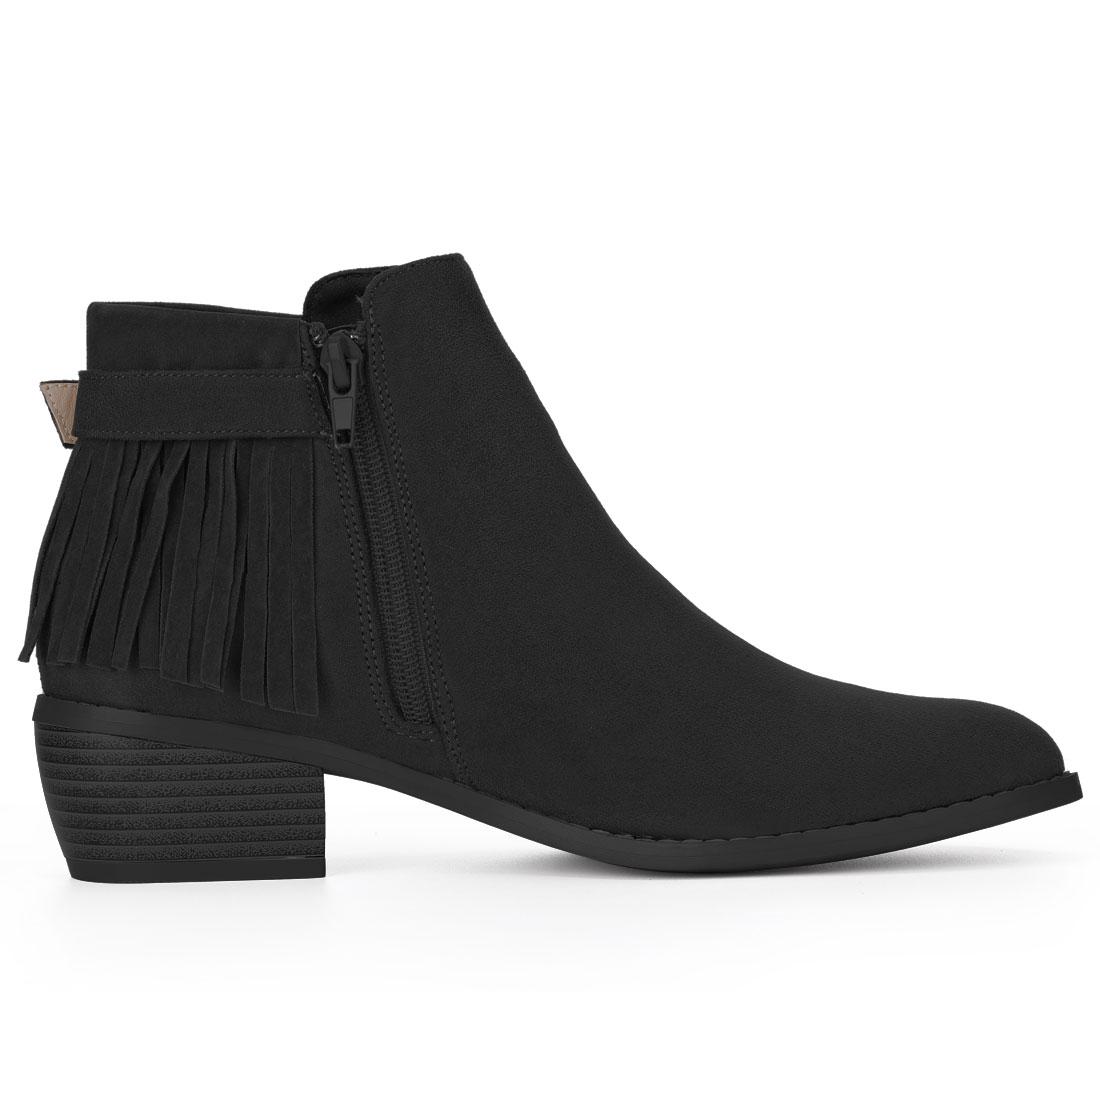 Women Buckle Strap Tassel Low Chunky Heel Booties Black US 9